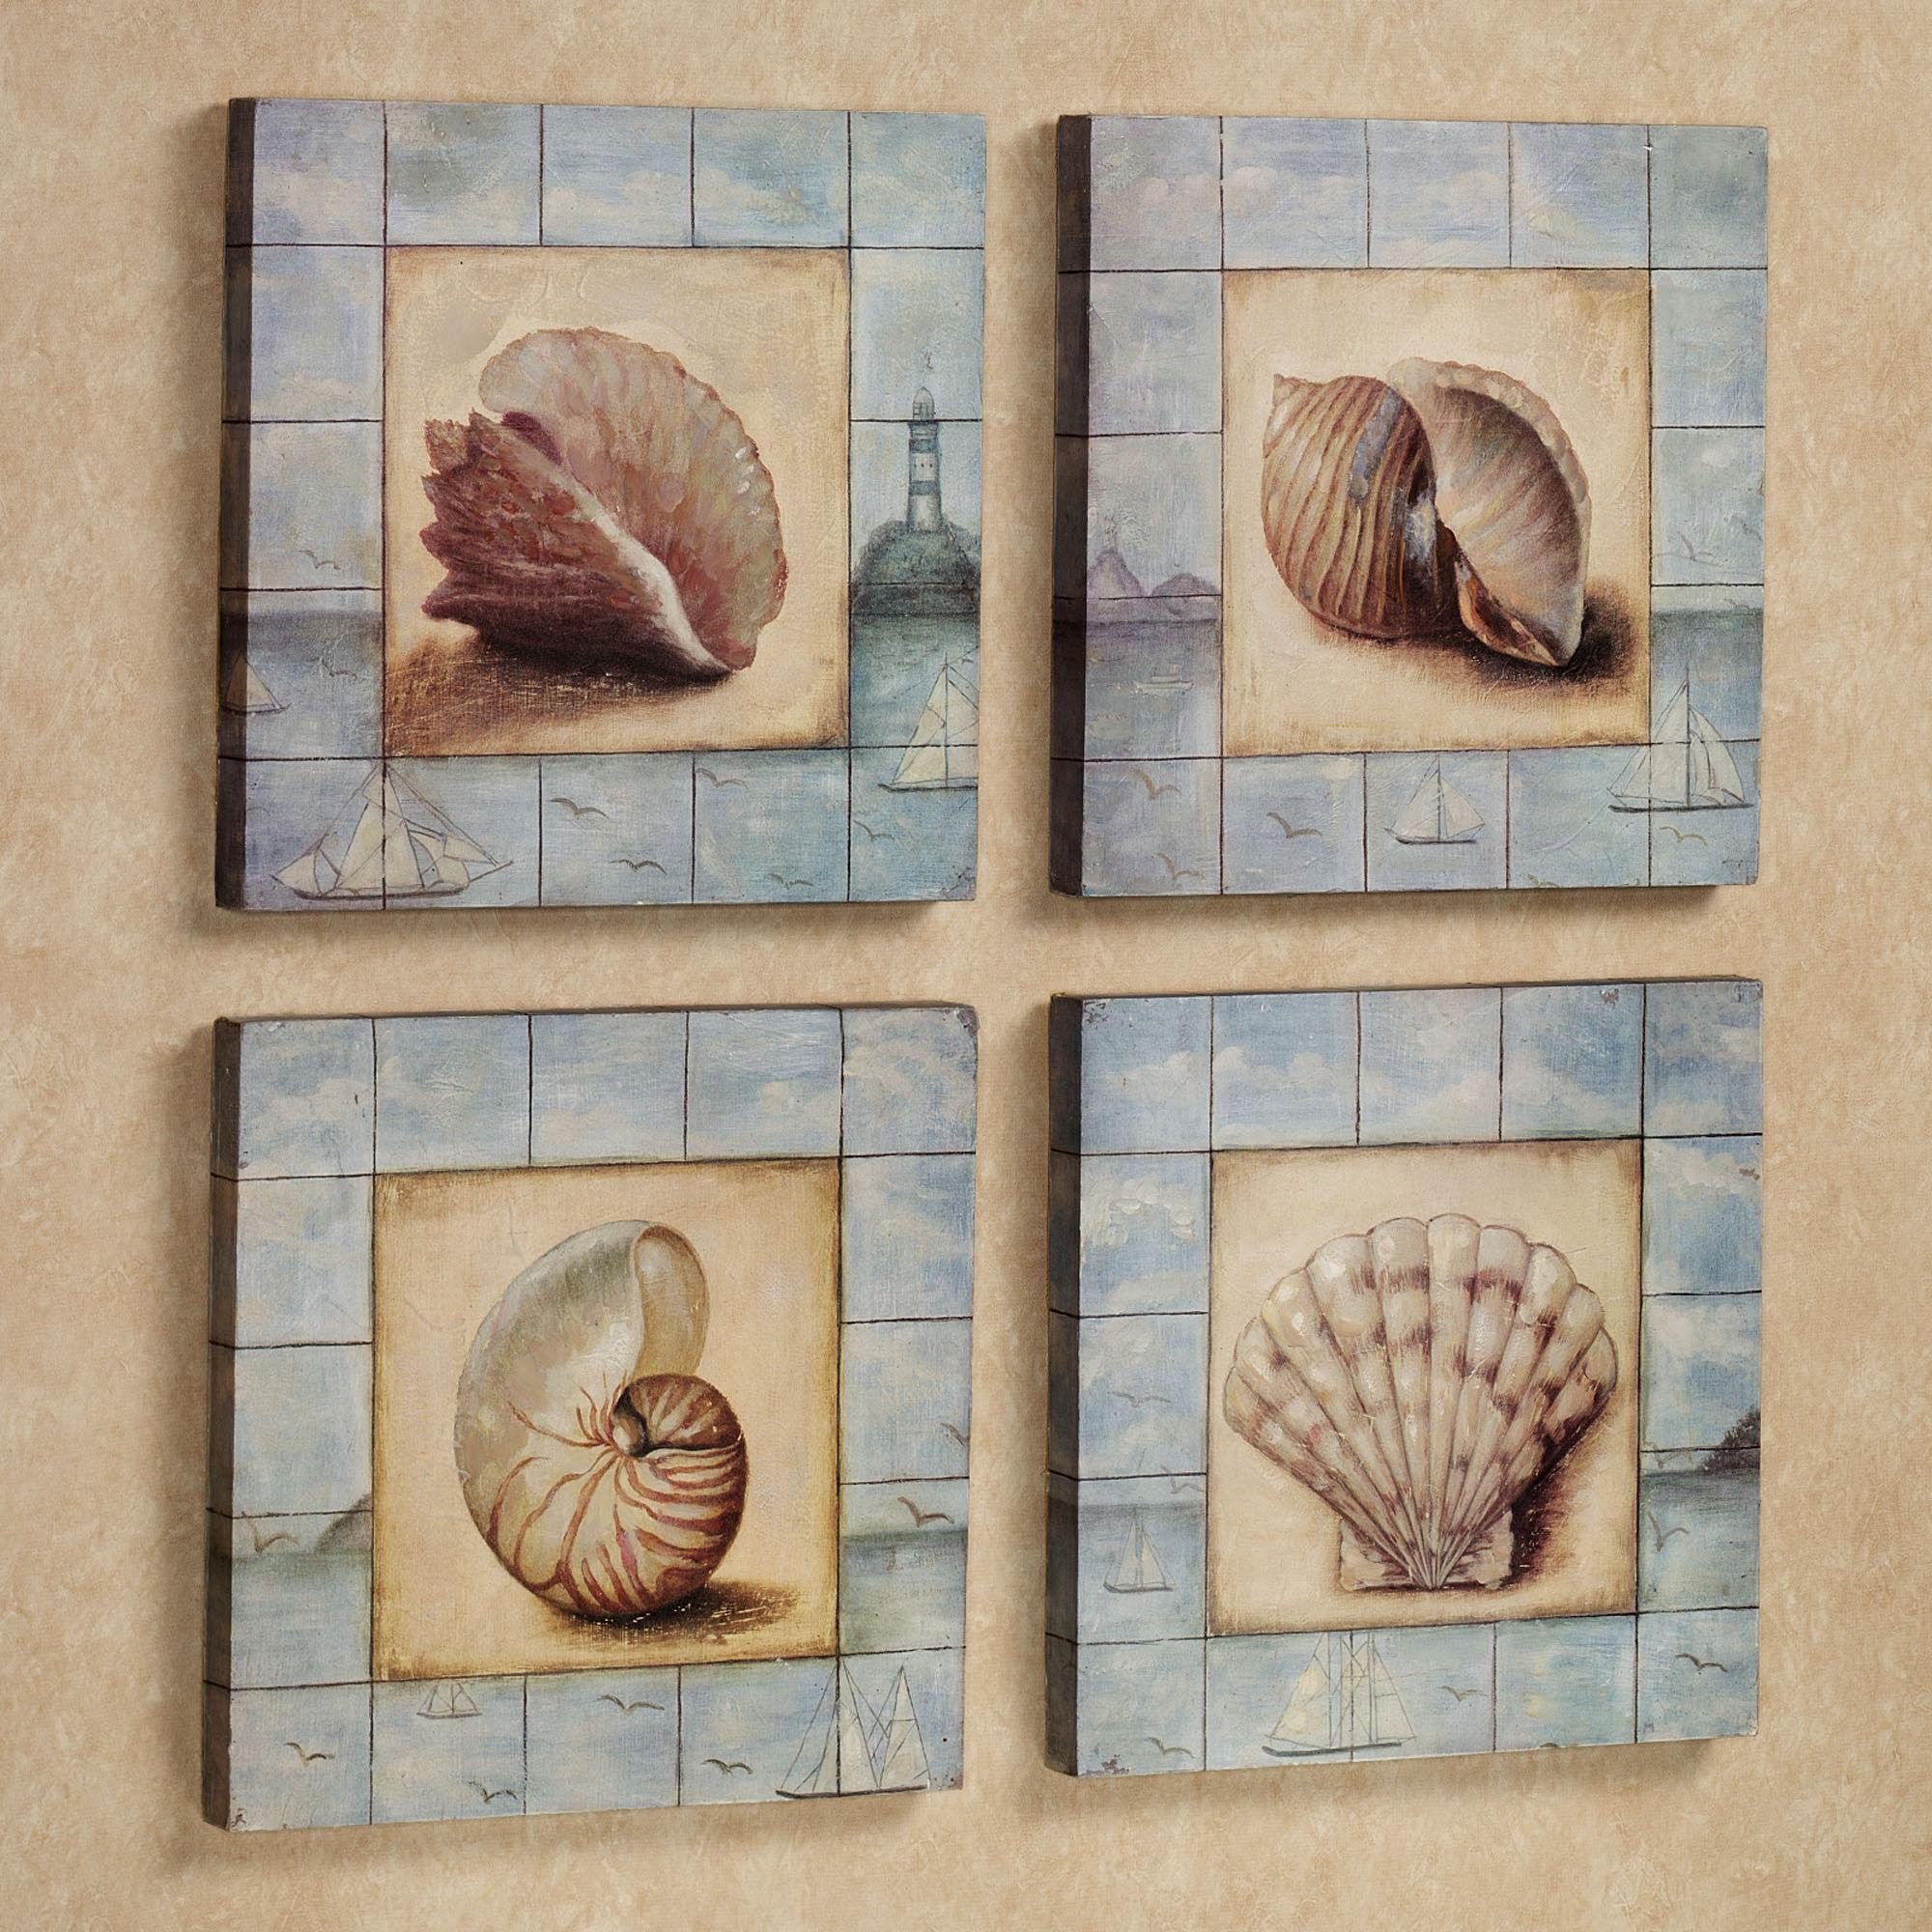 Ceramic Seashell Wall Decor : Make Nautical Wall With Seashell Regarding Seashell Prints Wall Art (Image 6 of 20)